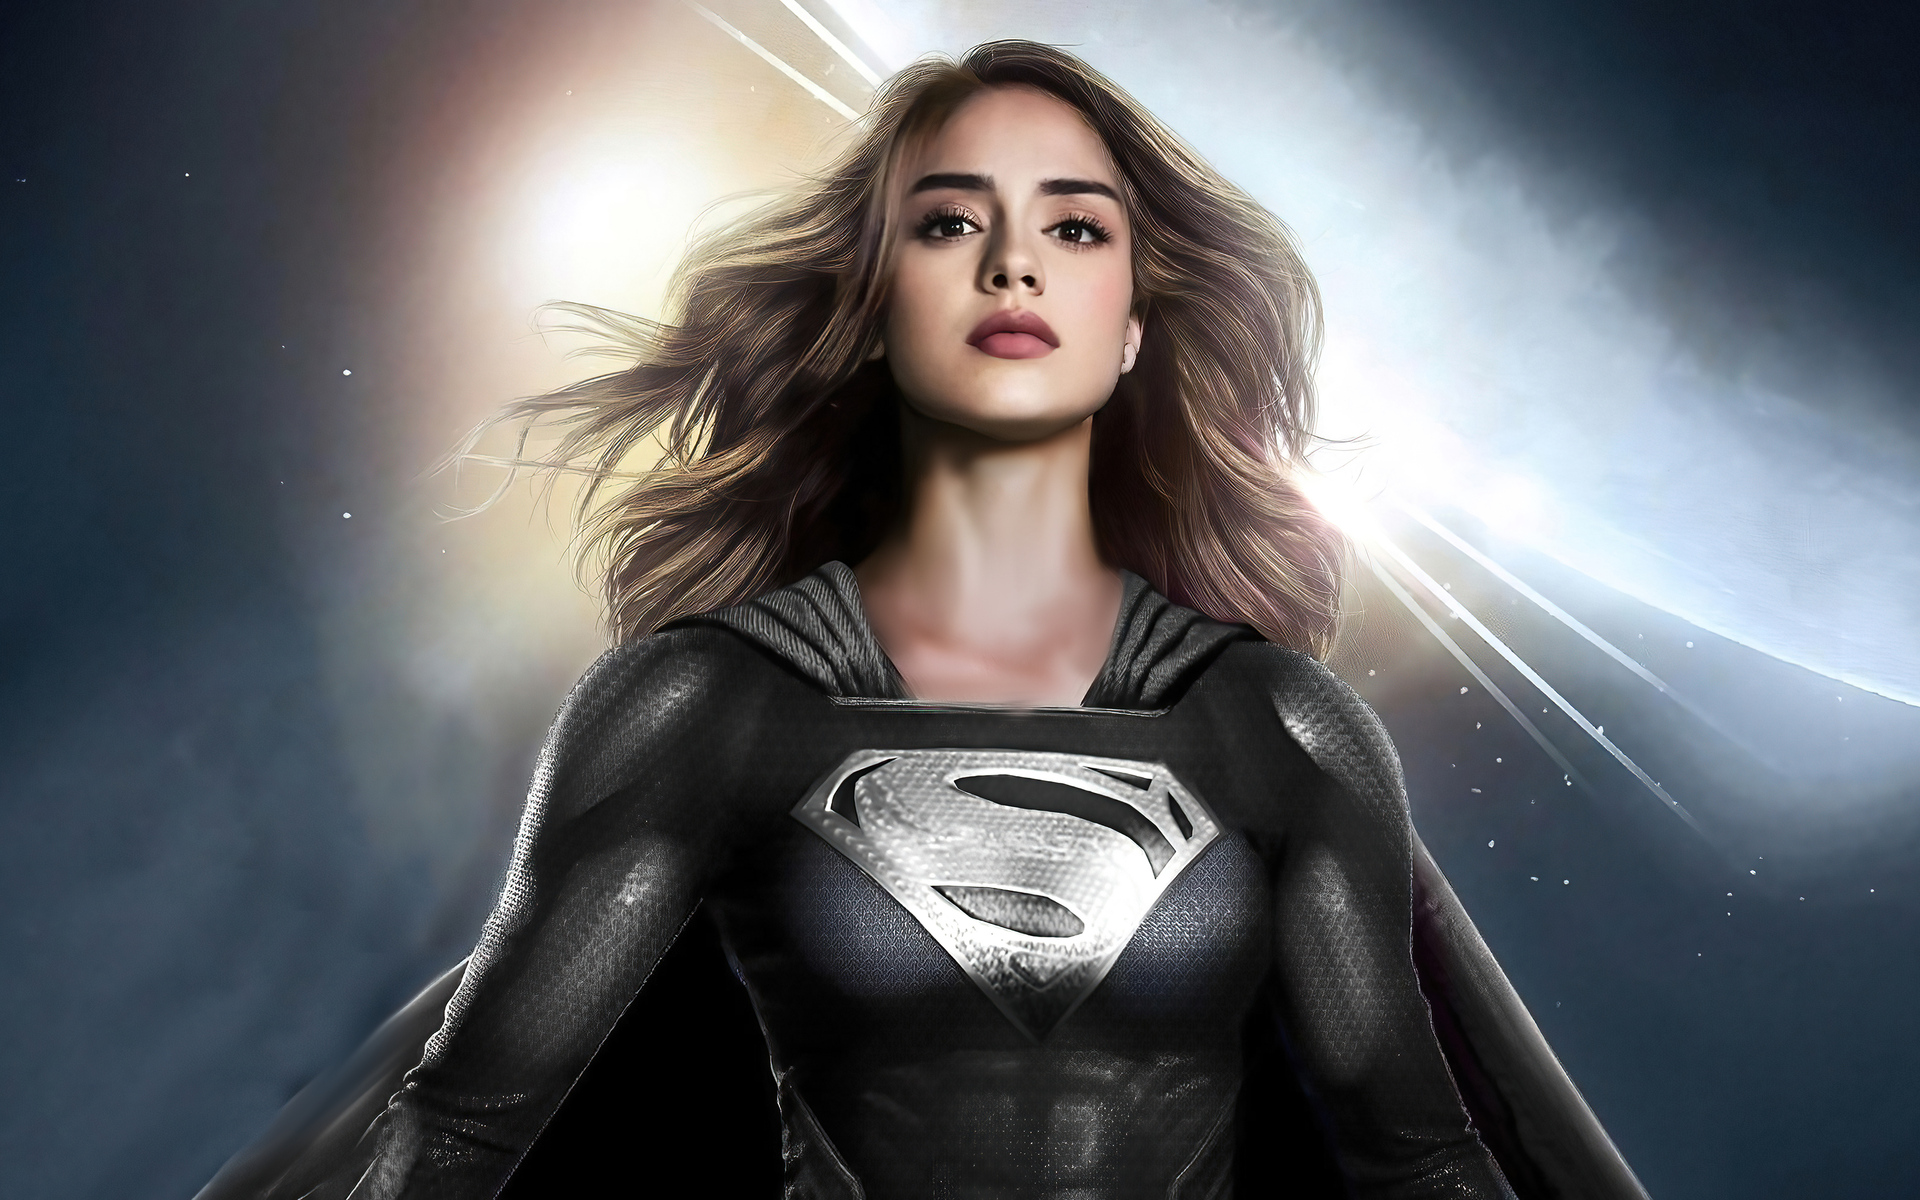 sasha-calle-supergirl-fan-art-black-suit-4k-96.jpg